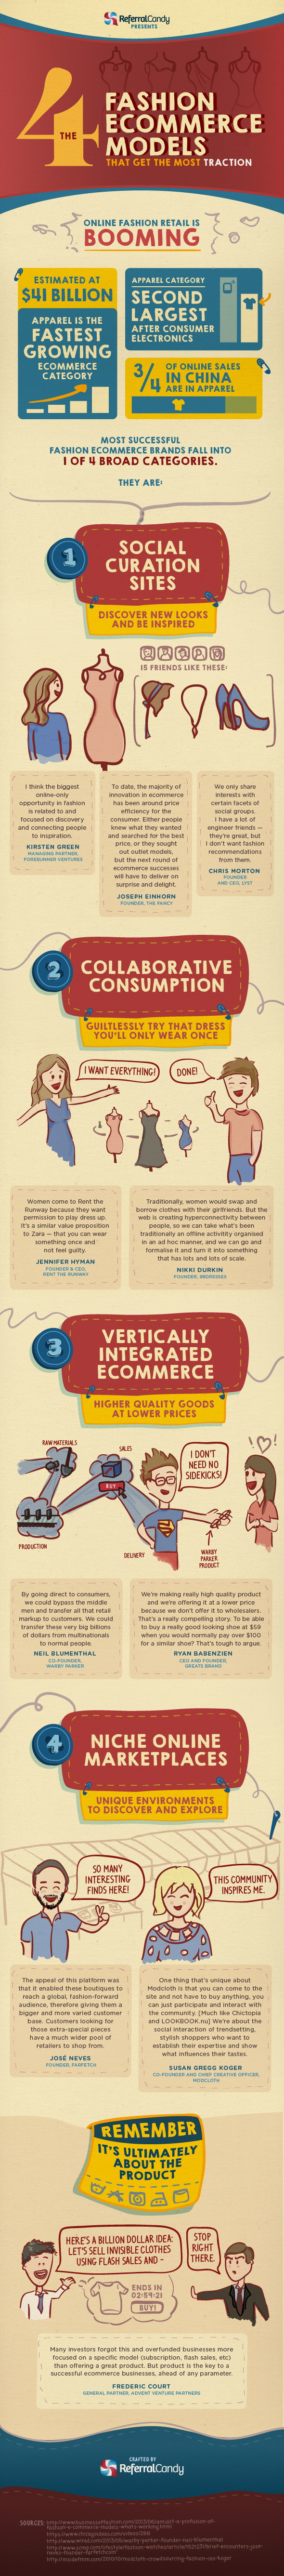 fashion ecommerce models